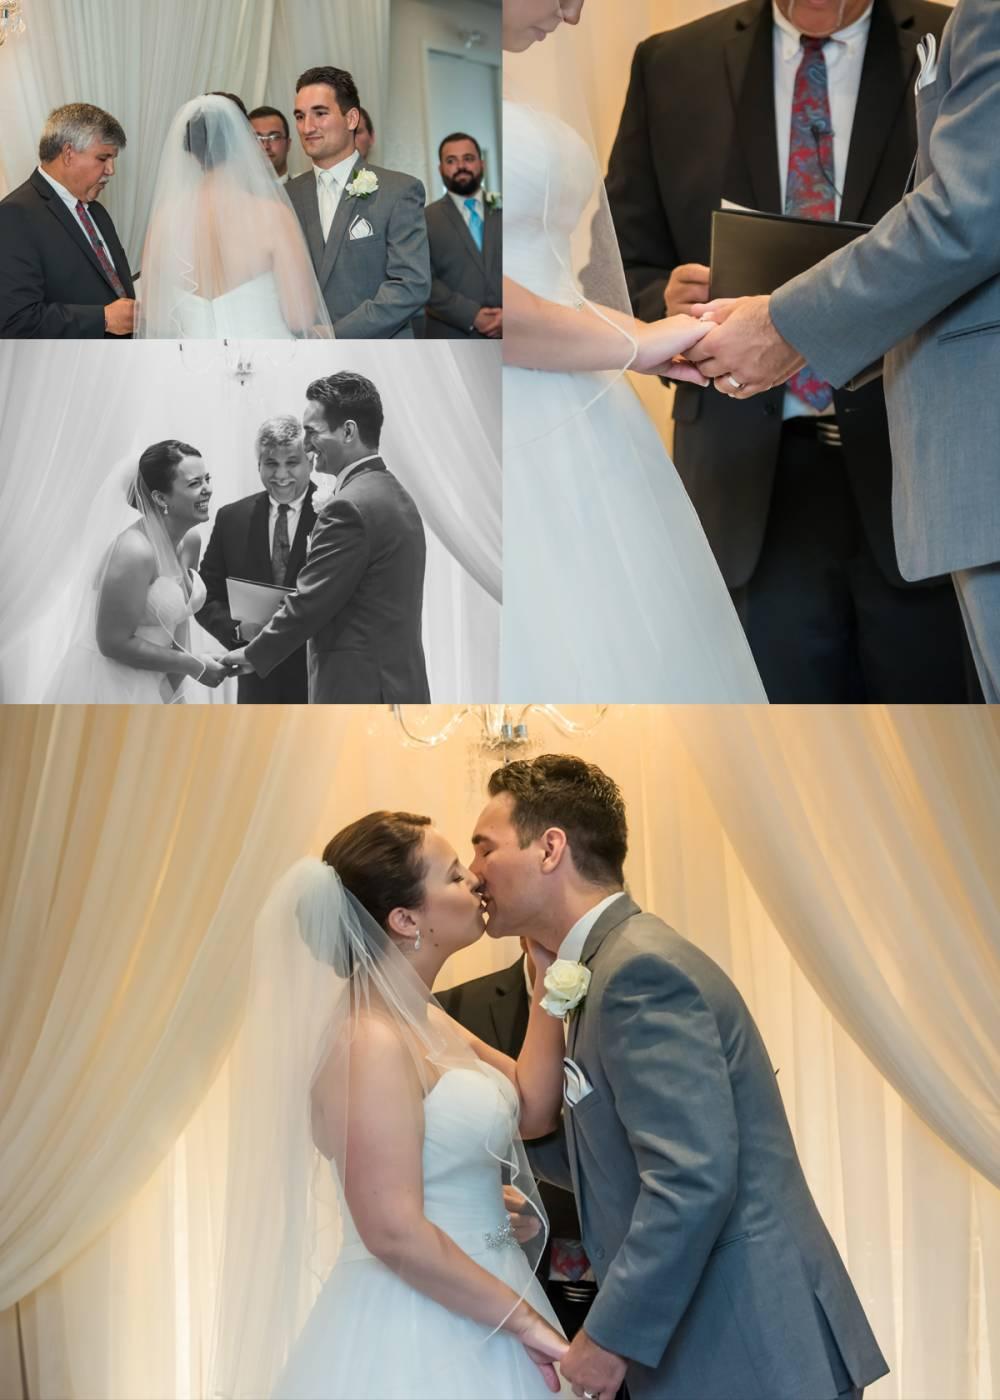 Ceremony Photography by Tanya Sinnett